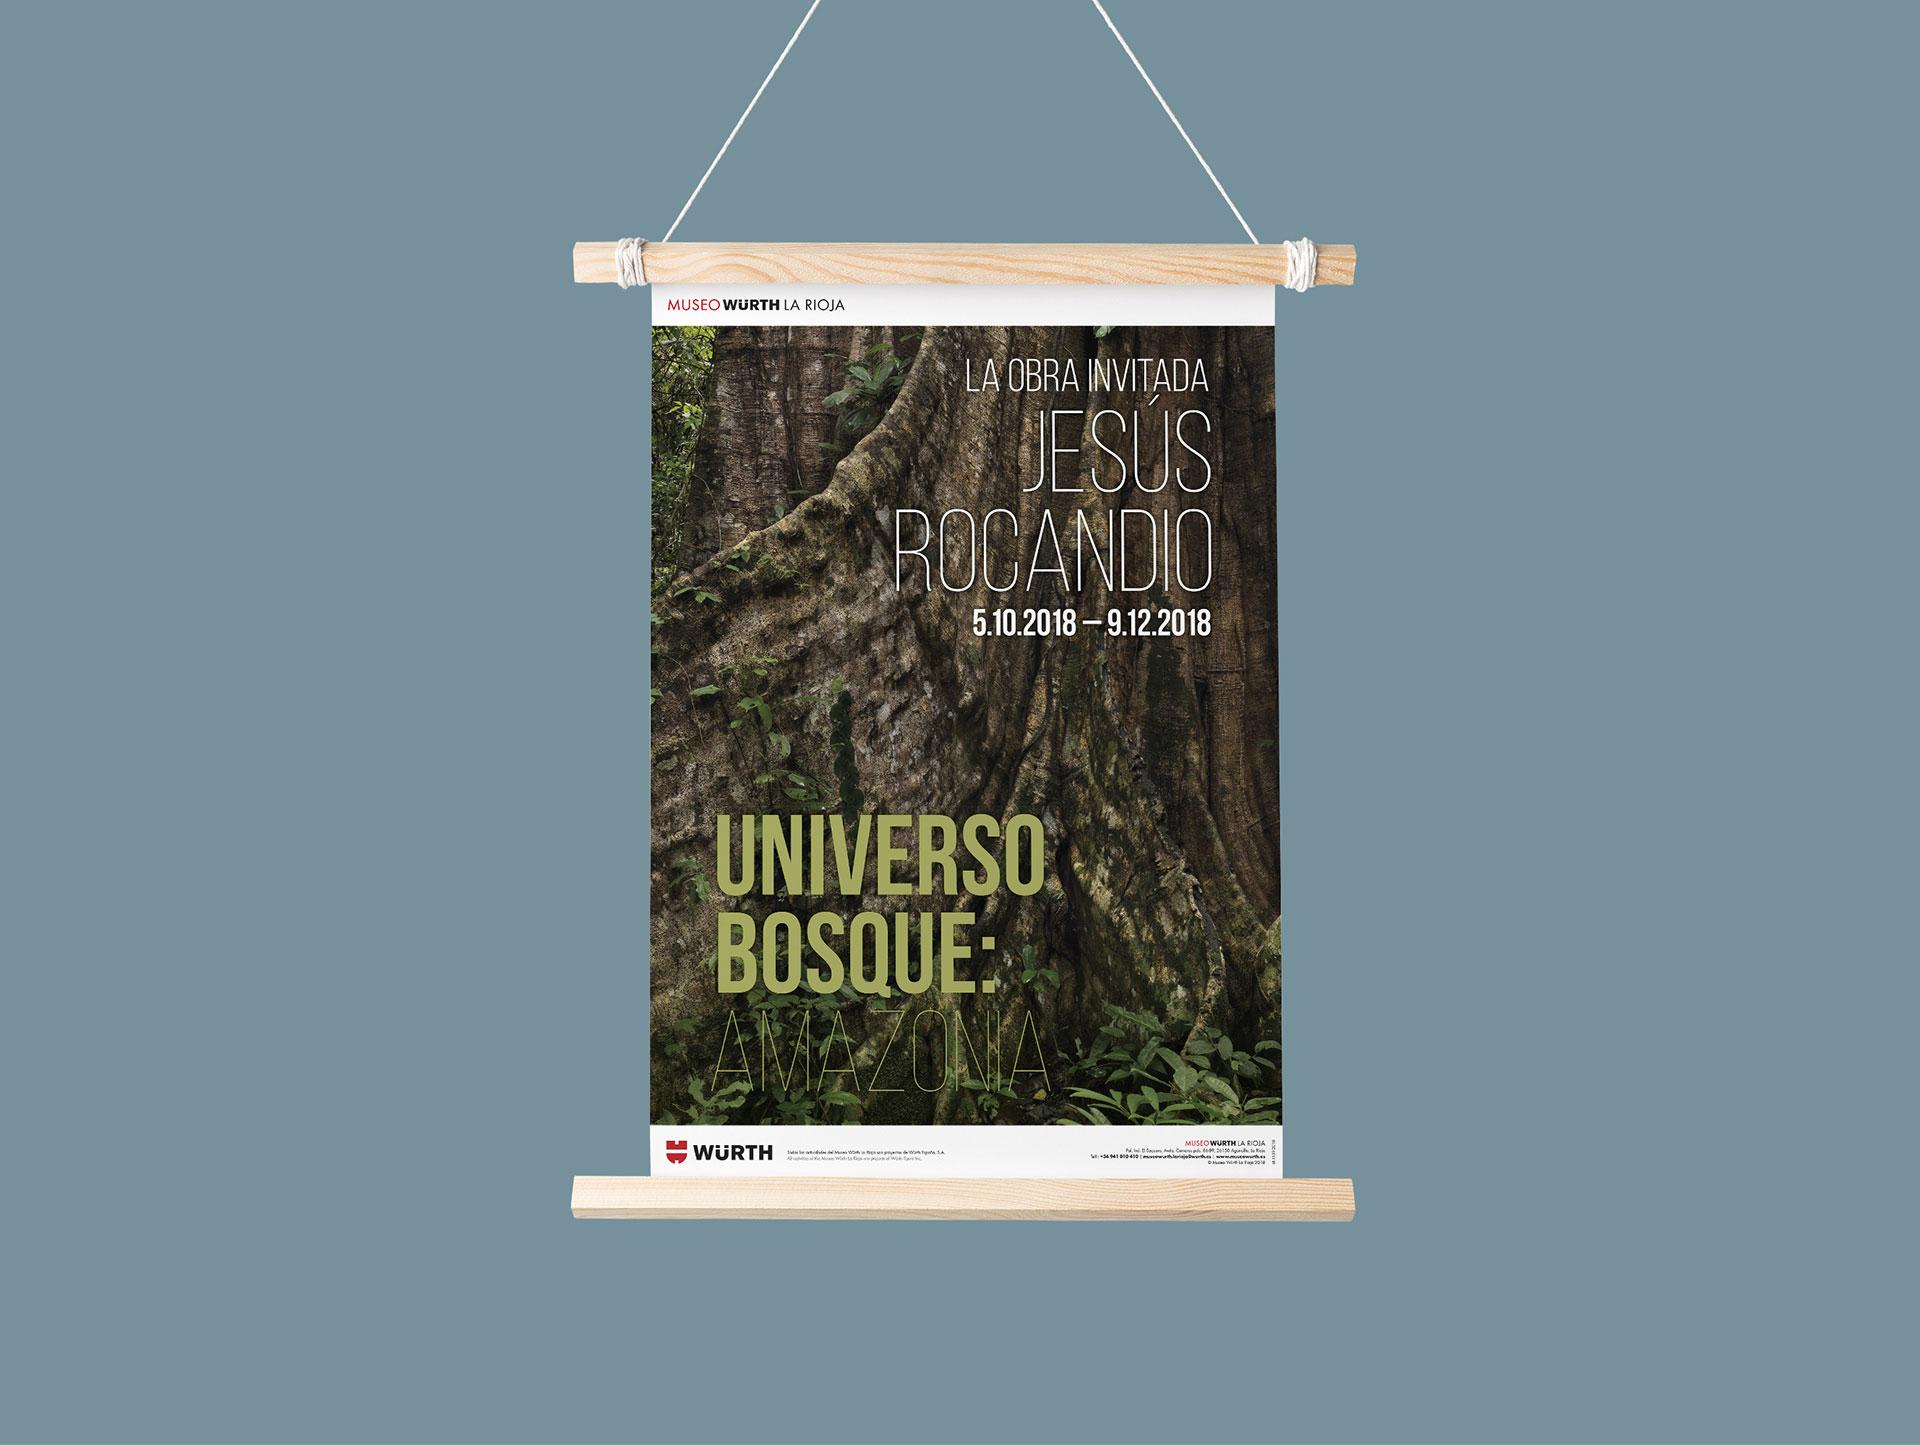 diseño cartel exposición universo bosque amazonía